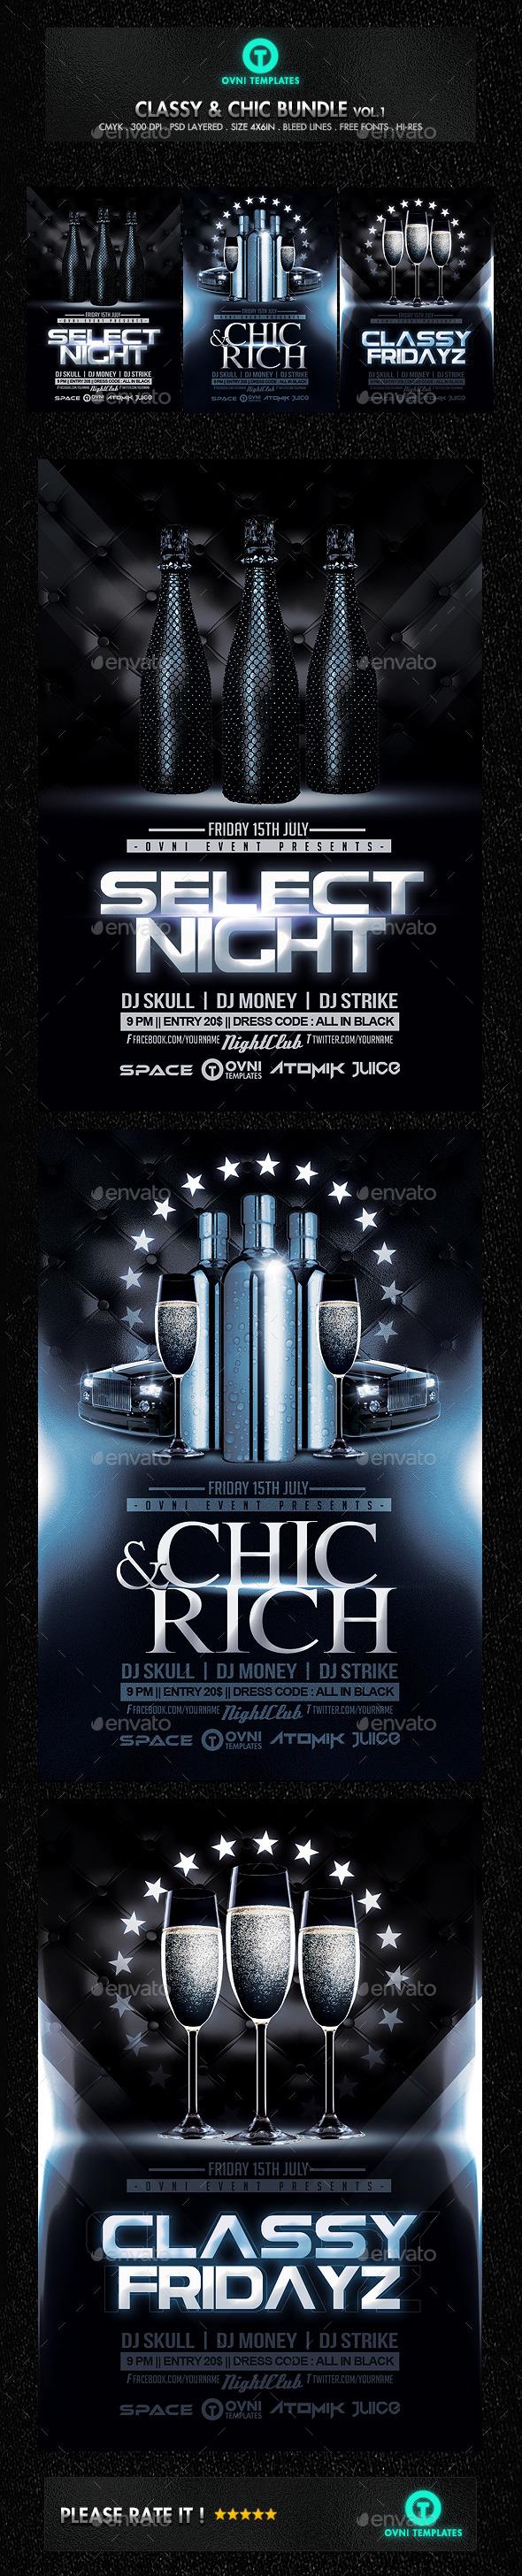 GraphicRiver Classy Chic VIP Flyer Bundle 11356962